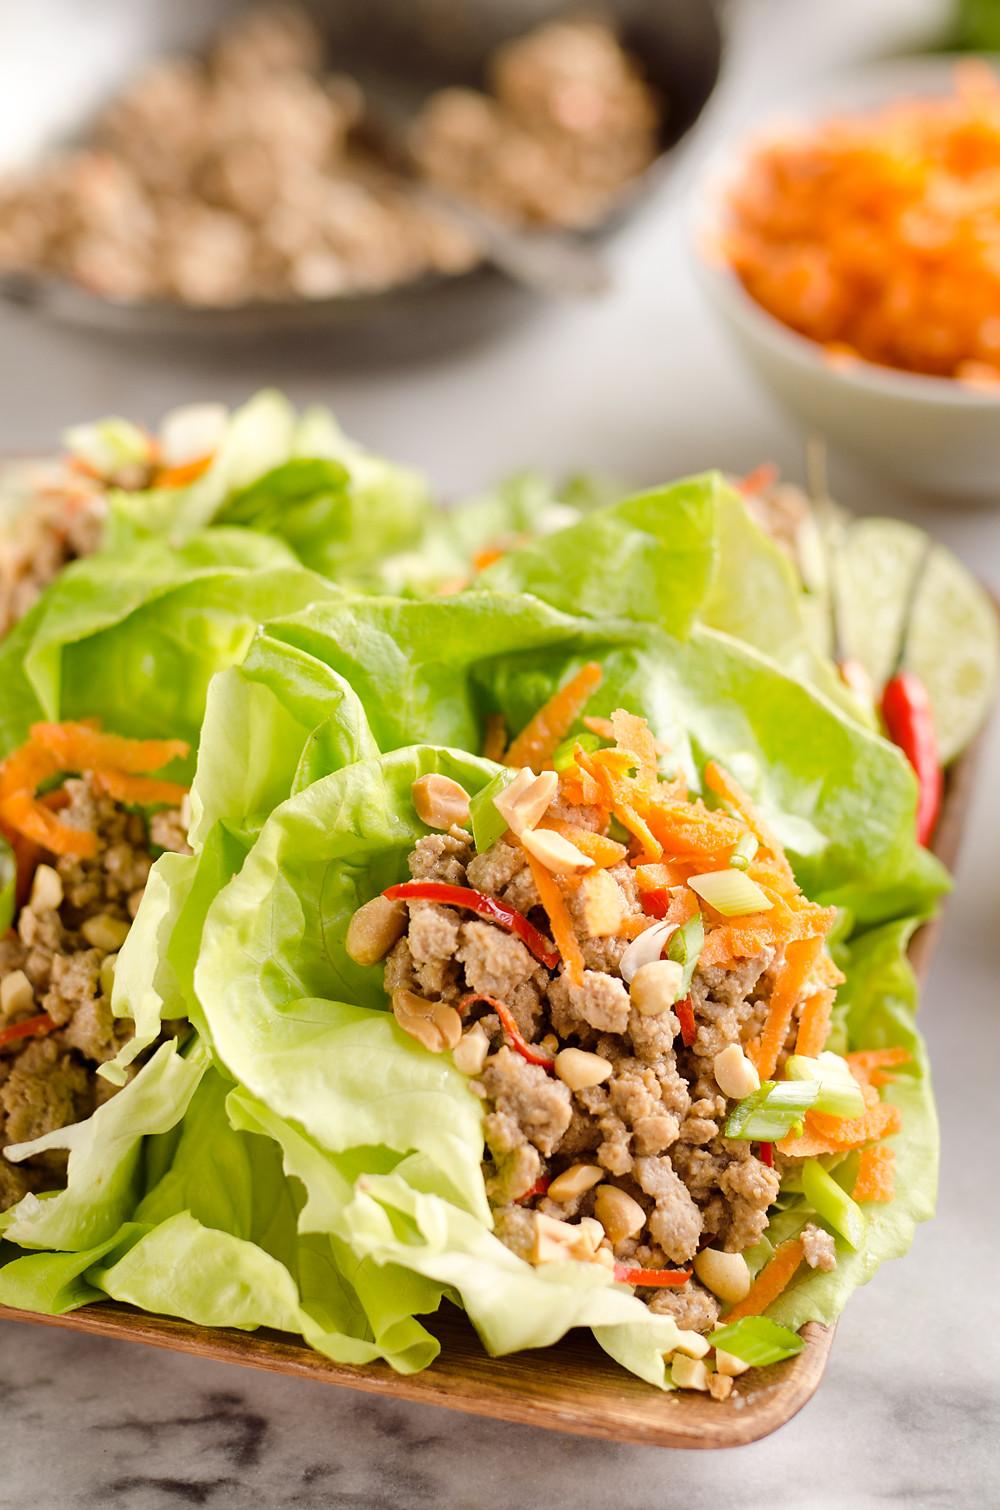 Healthy Filling Dinners  Turkey Thai Peanut Lettuce Wraps